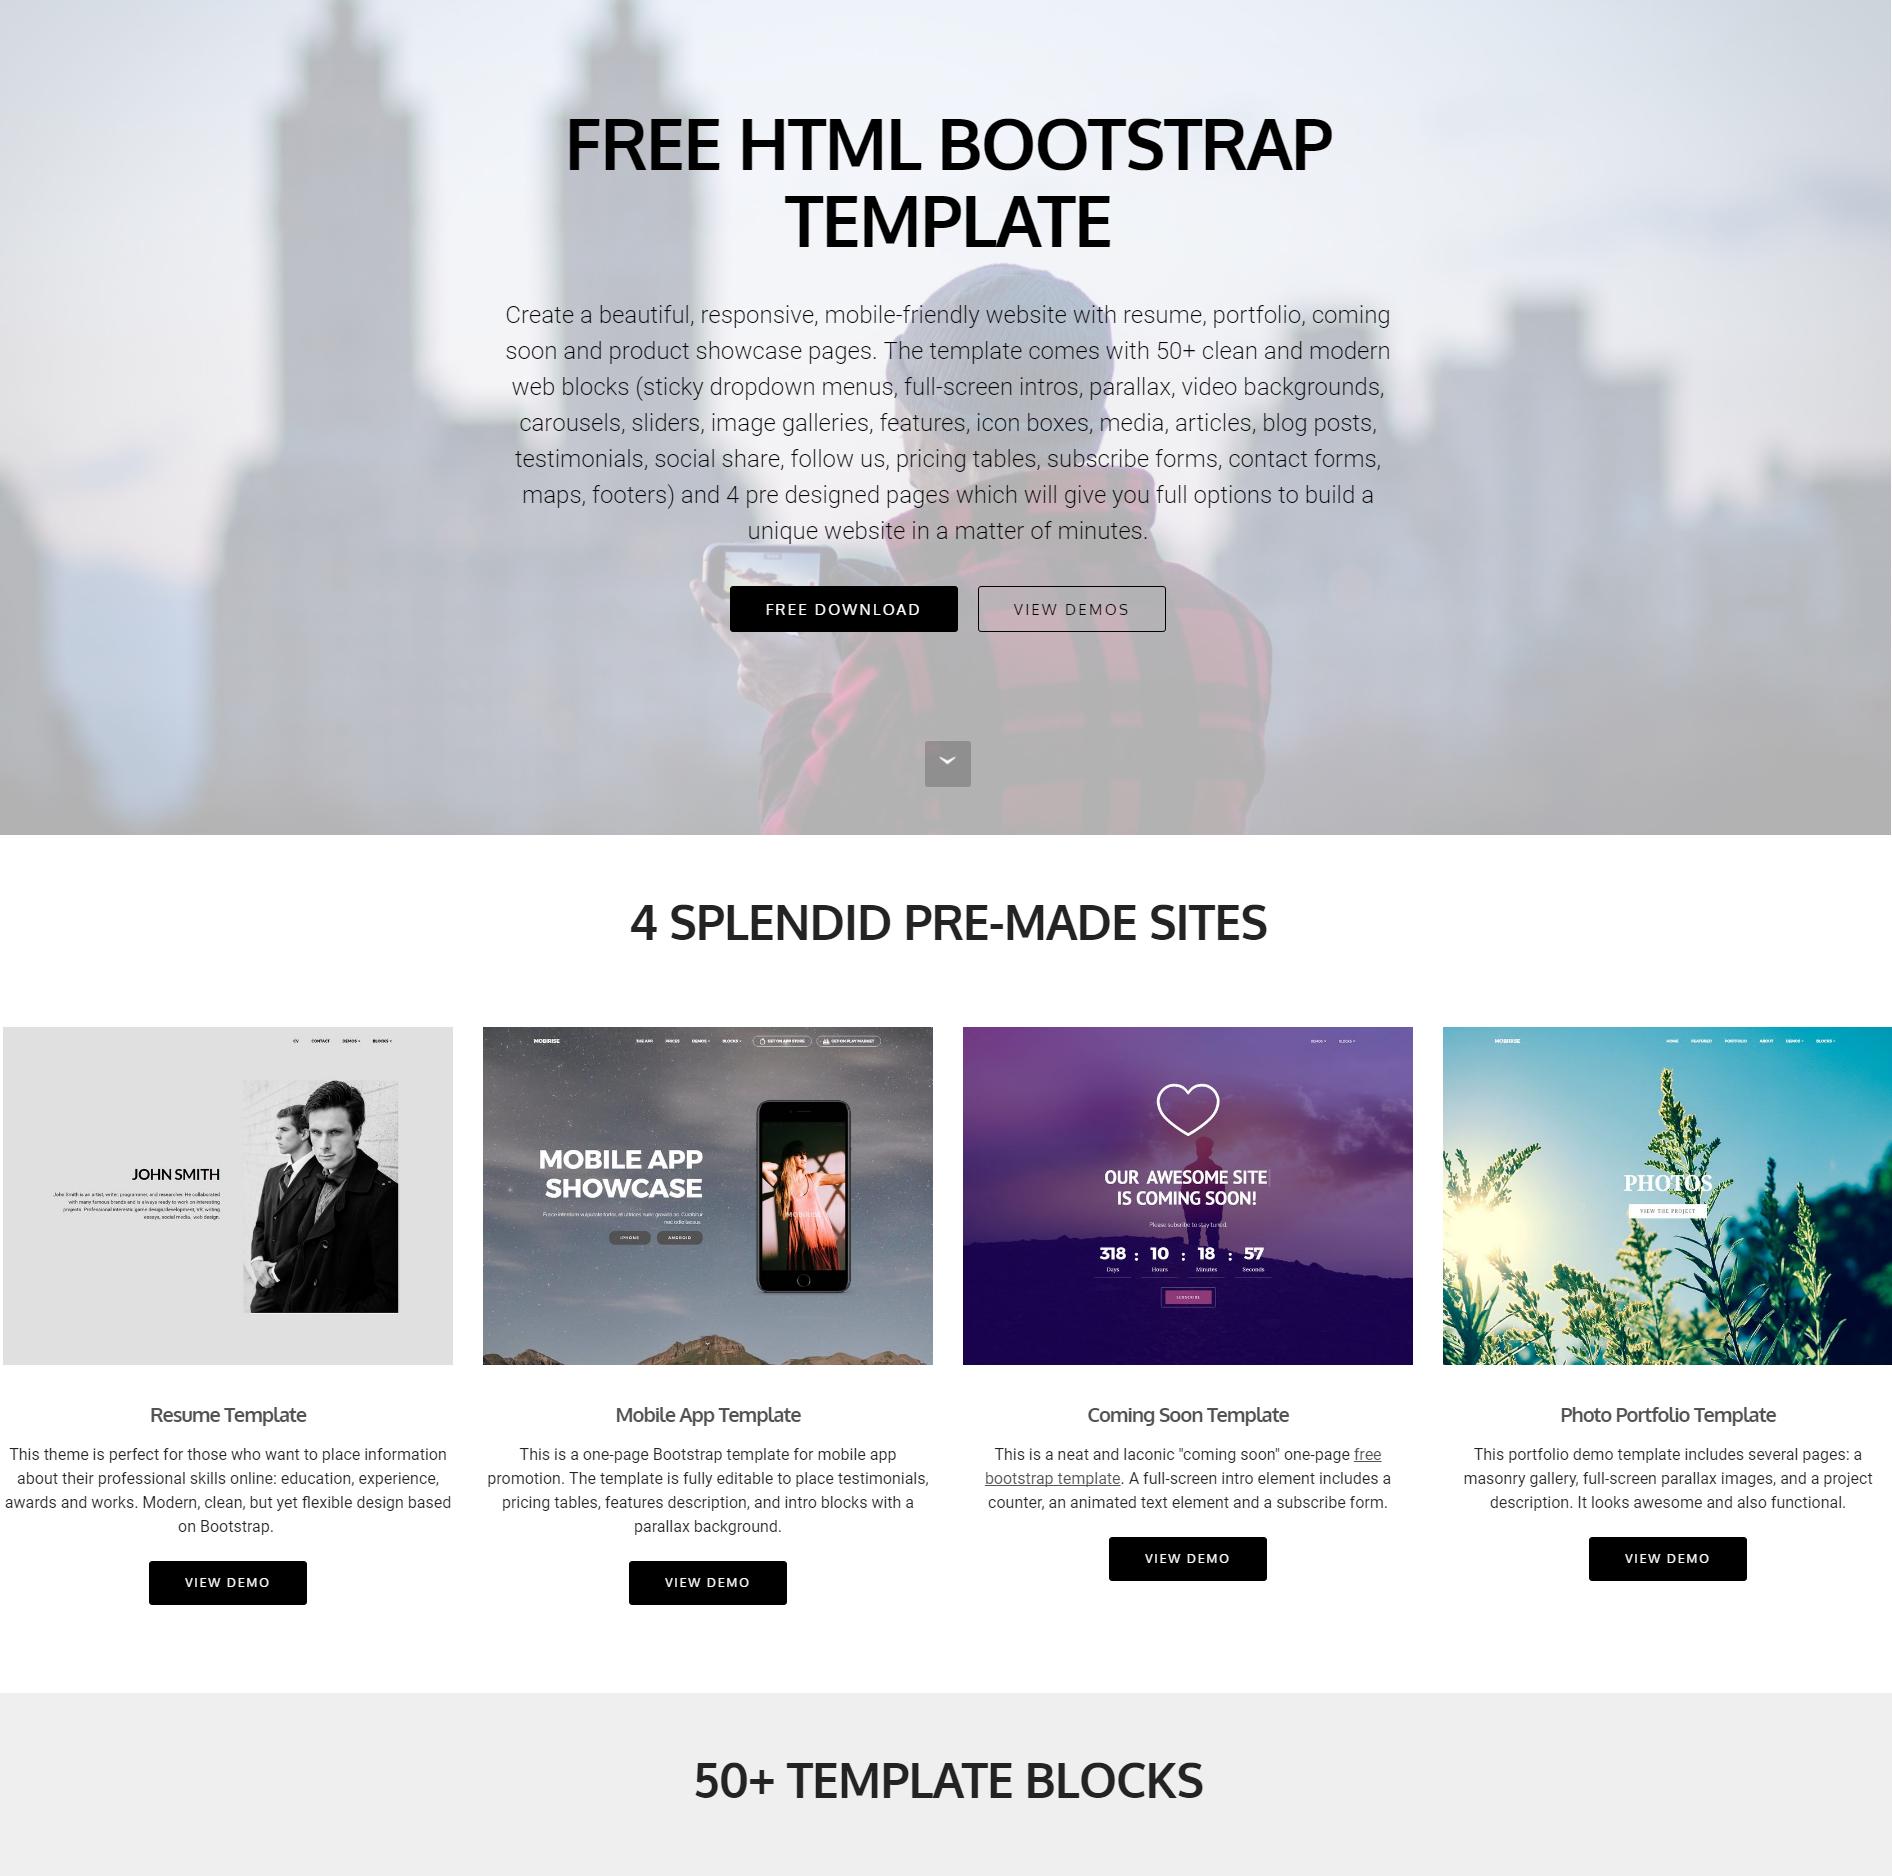 HTML5 Bootstrap 4 Blocks Templates